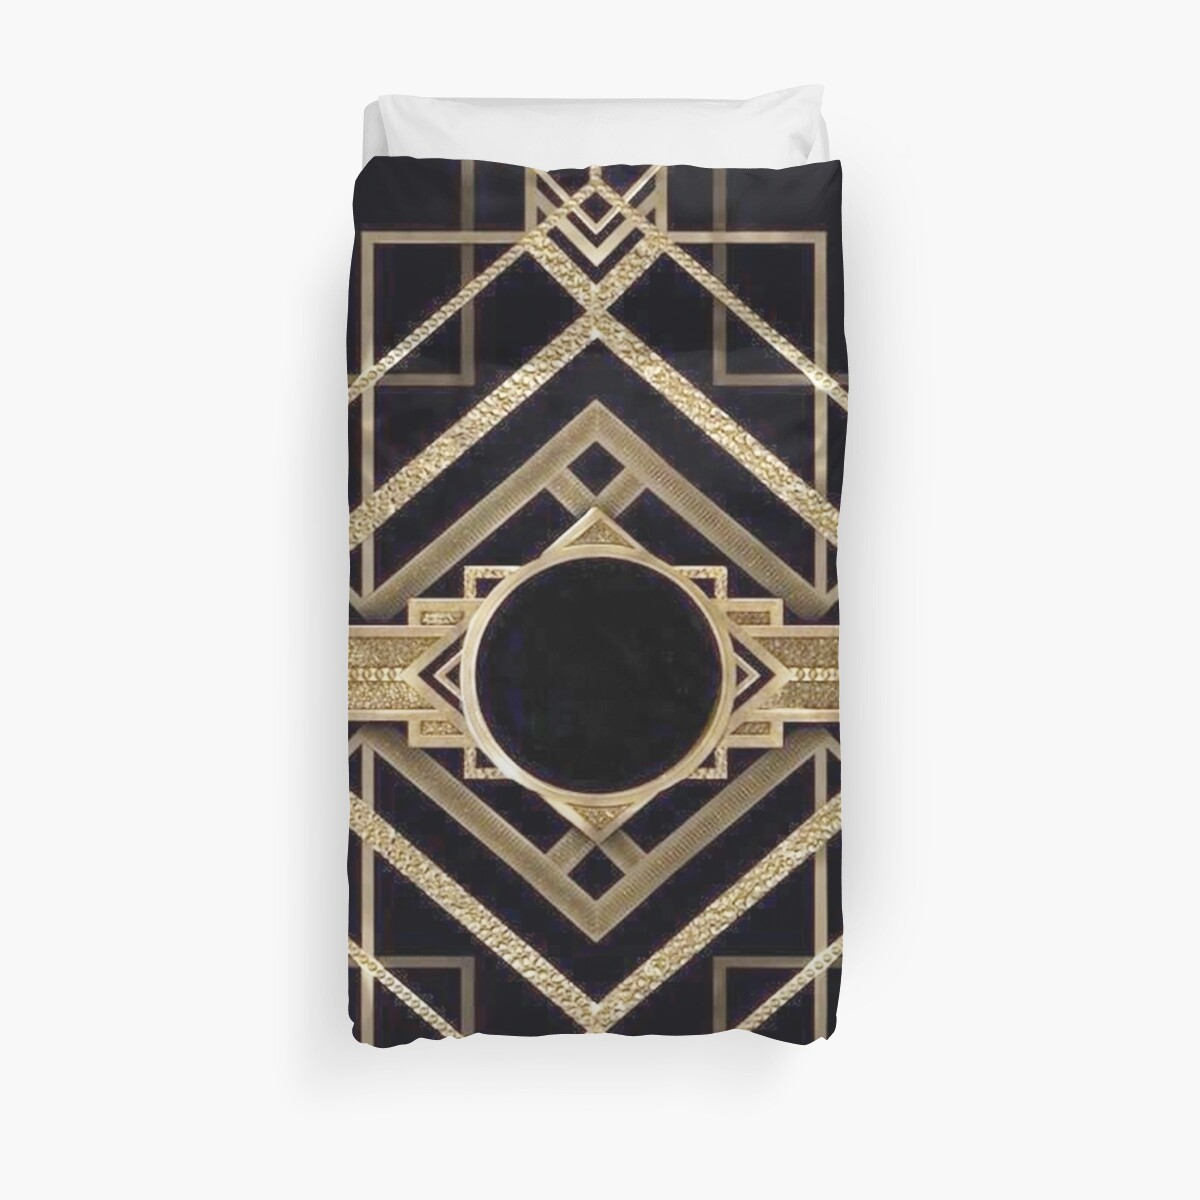 Art deco,vintage,1920 era,The Great Gatsby,gold,black,pattern,elegant,chic,modern,trendy by love999